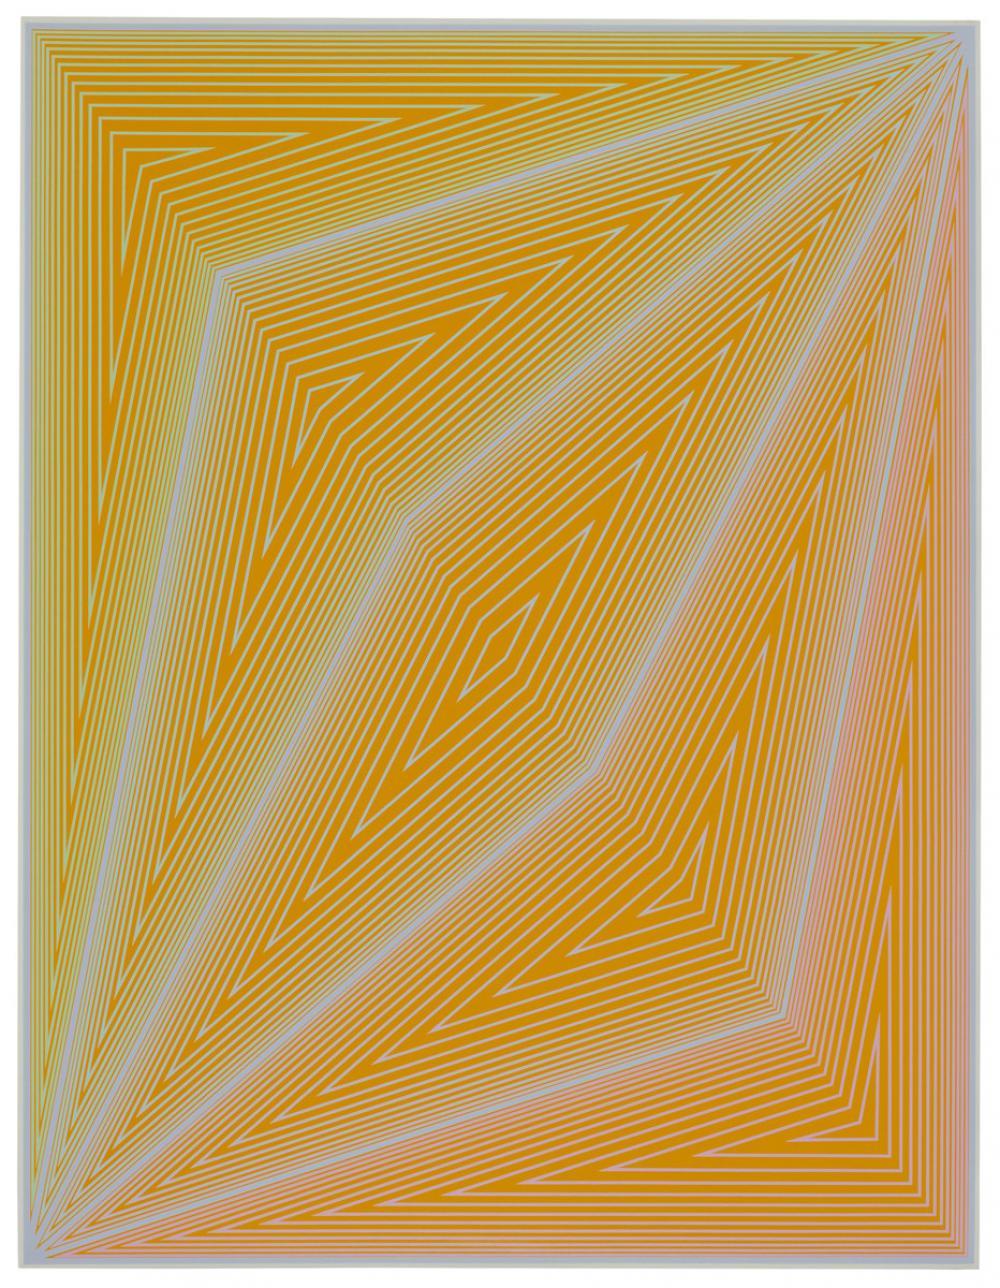 Richard Joseph Anuszkiewicz (American, b. 1930), The Inward Eye: #4 art